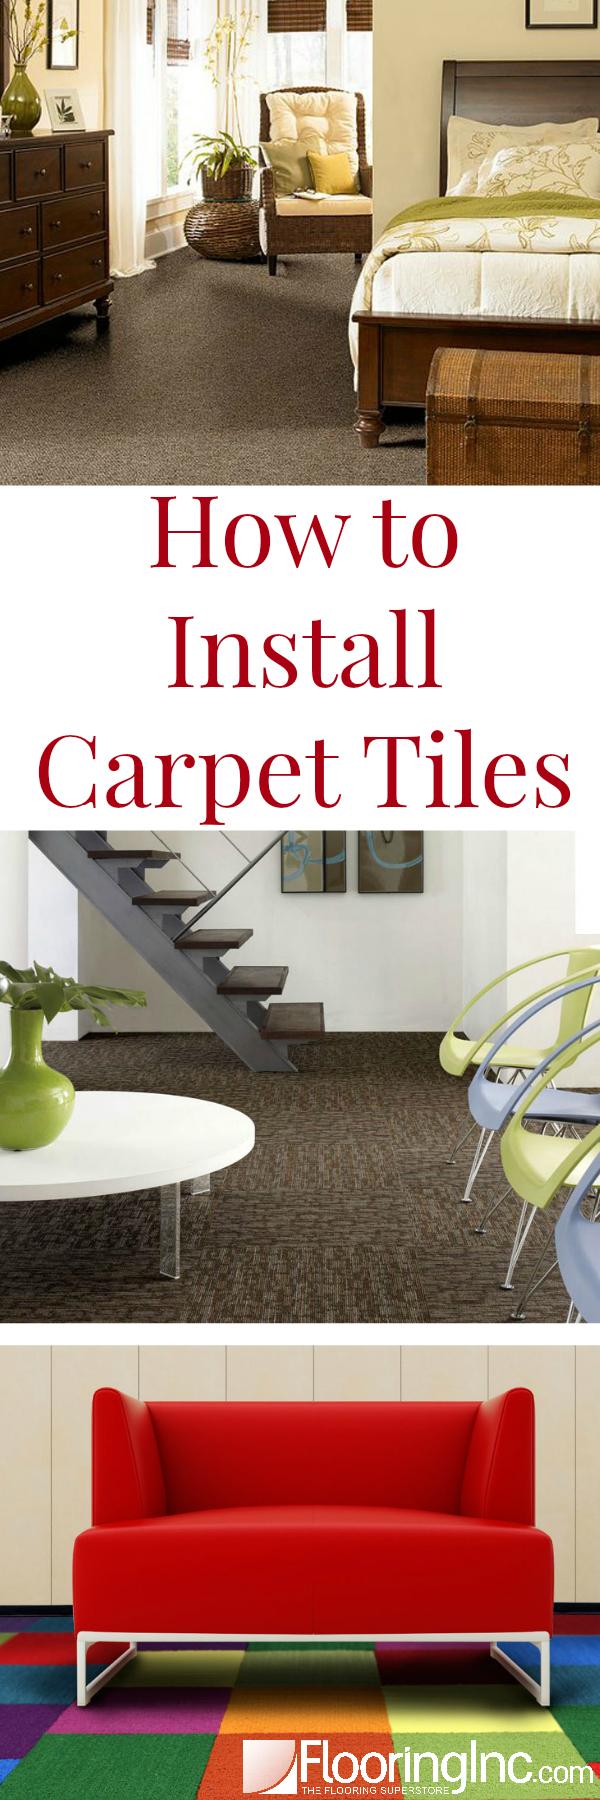 How to Install Carpet Tiles in 4 easy steps!